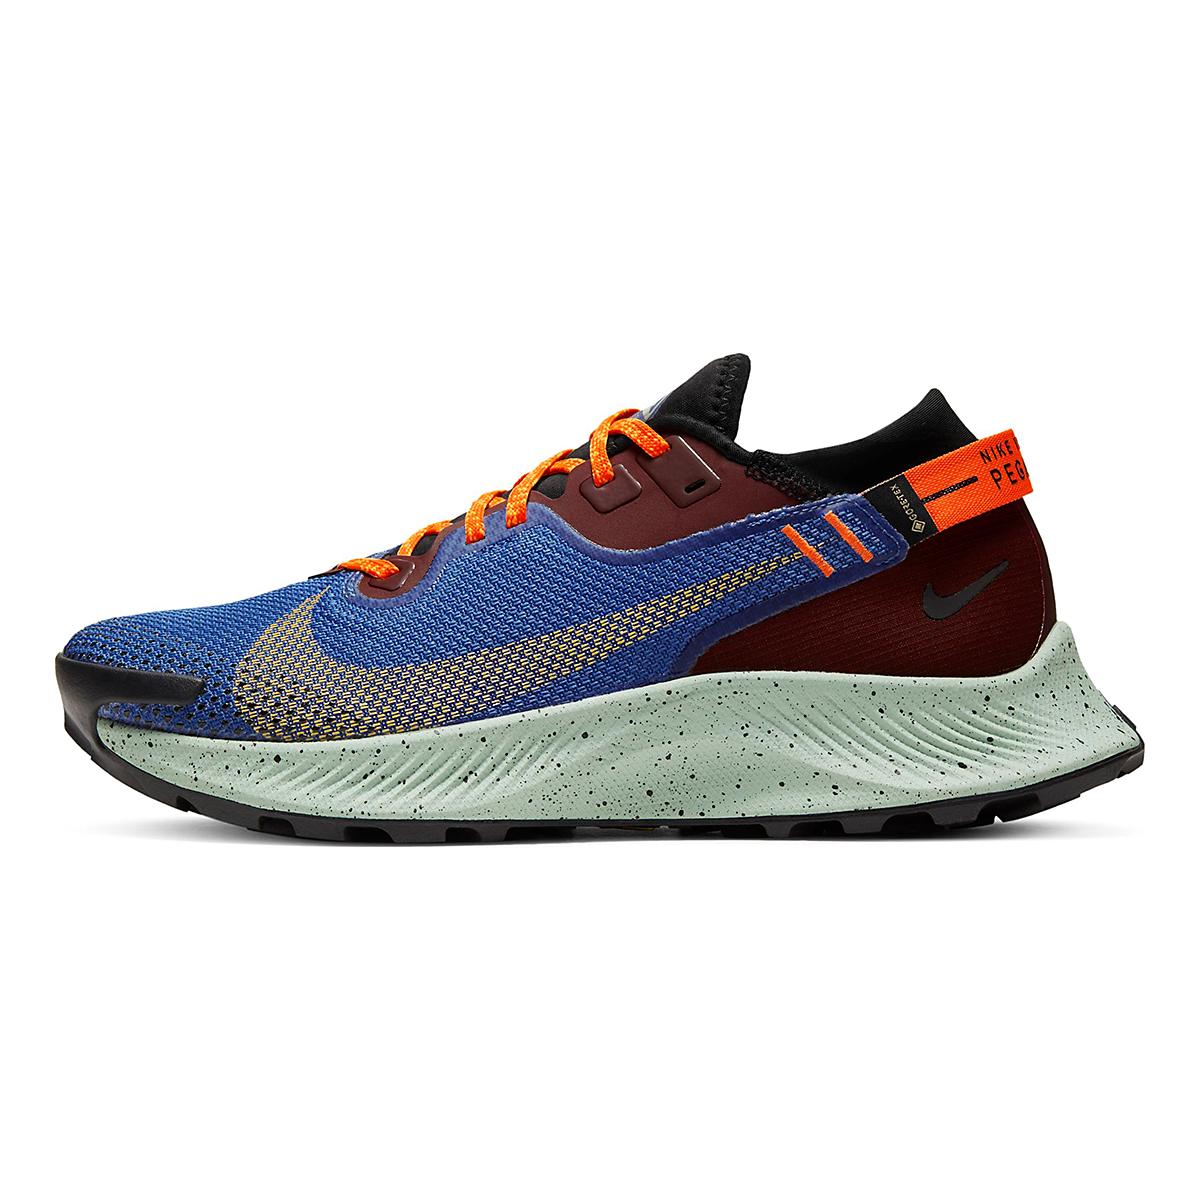 Women's Nike Pegasus Trail 2 Gore-Tex Trail Running Shoe - Color: Mystic Dates/Laser Orange/ Astronomy Blue - Size: 5 - Width: Regular, Mystic Dates/Laser Orange/ Astronomy Blue, large, image 2